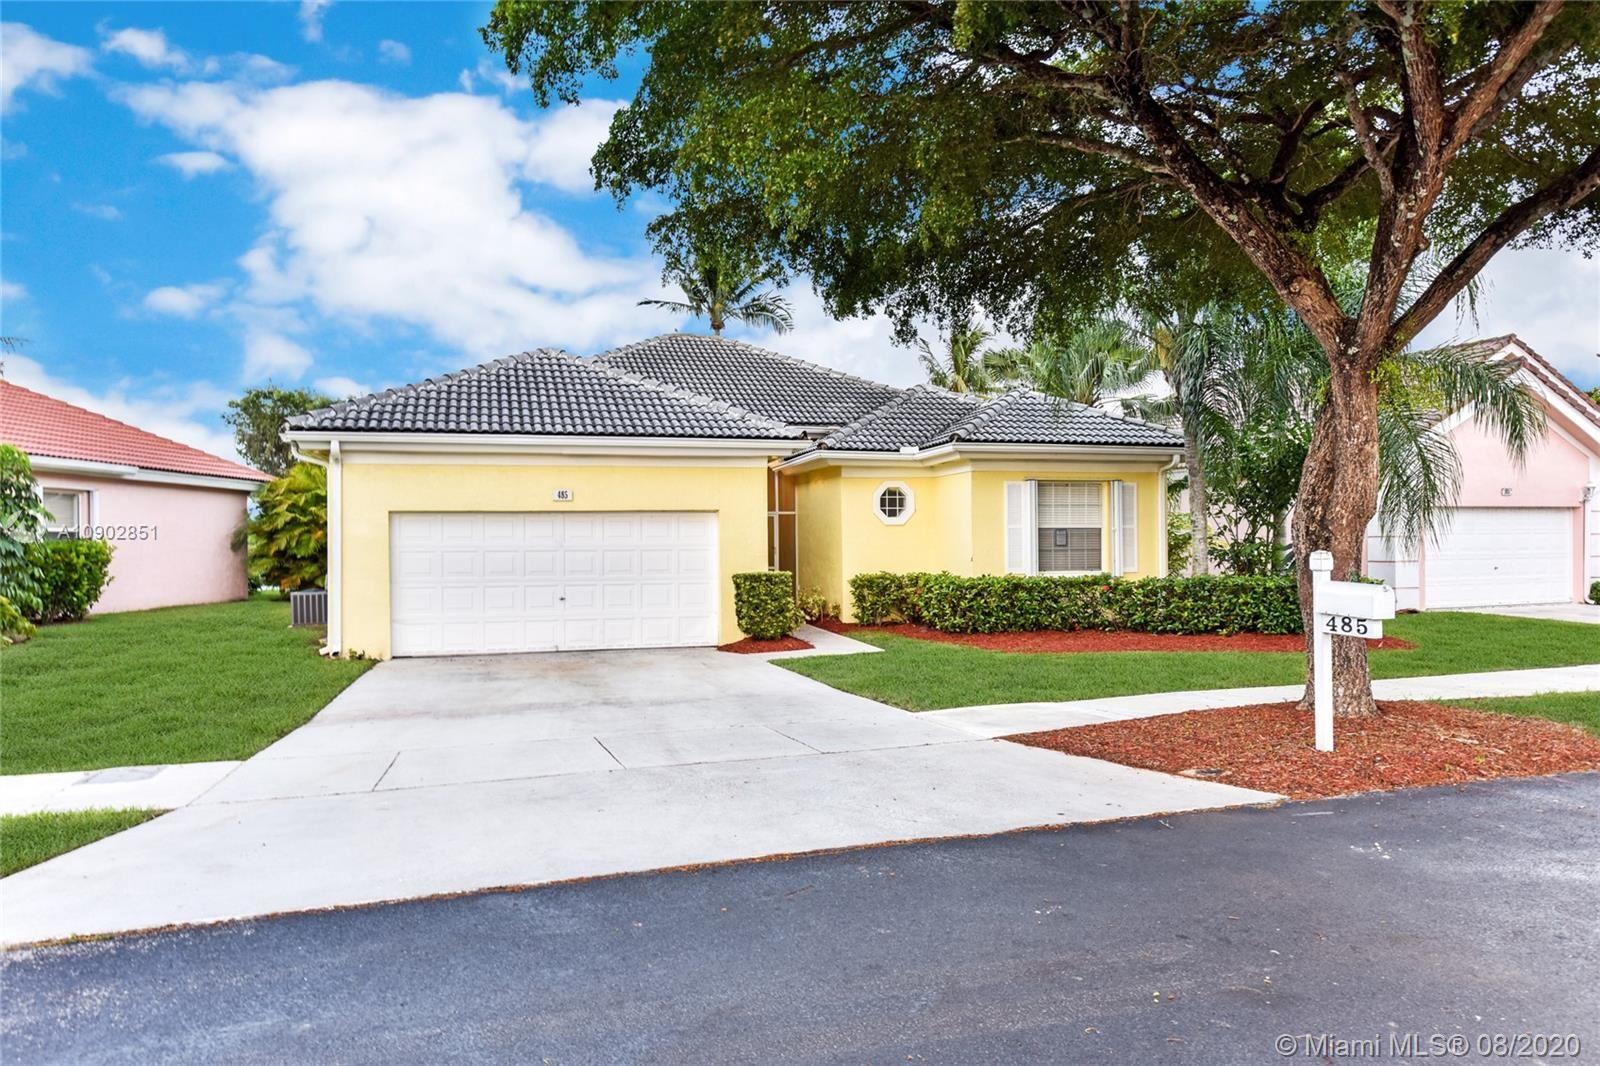 485 SE 26th Dr, Homestead, FL 33033 - #: A10902851